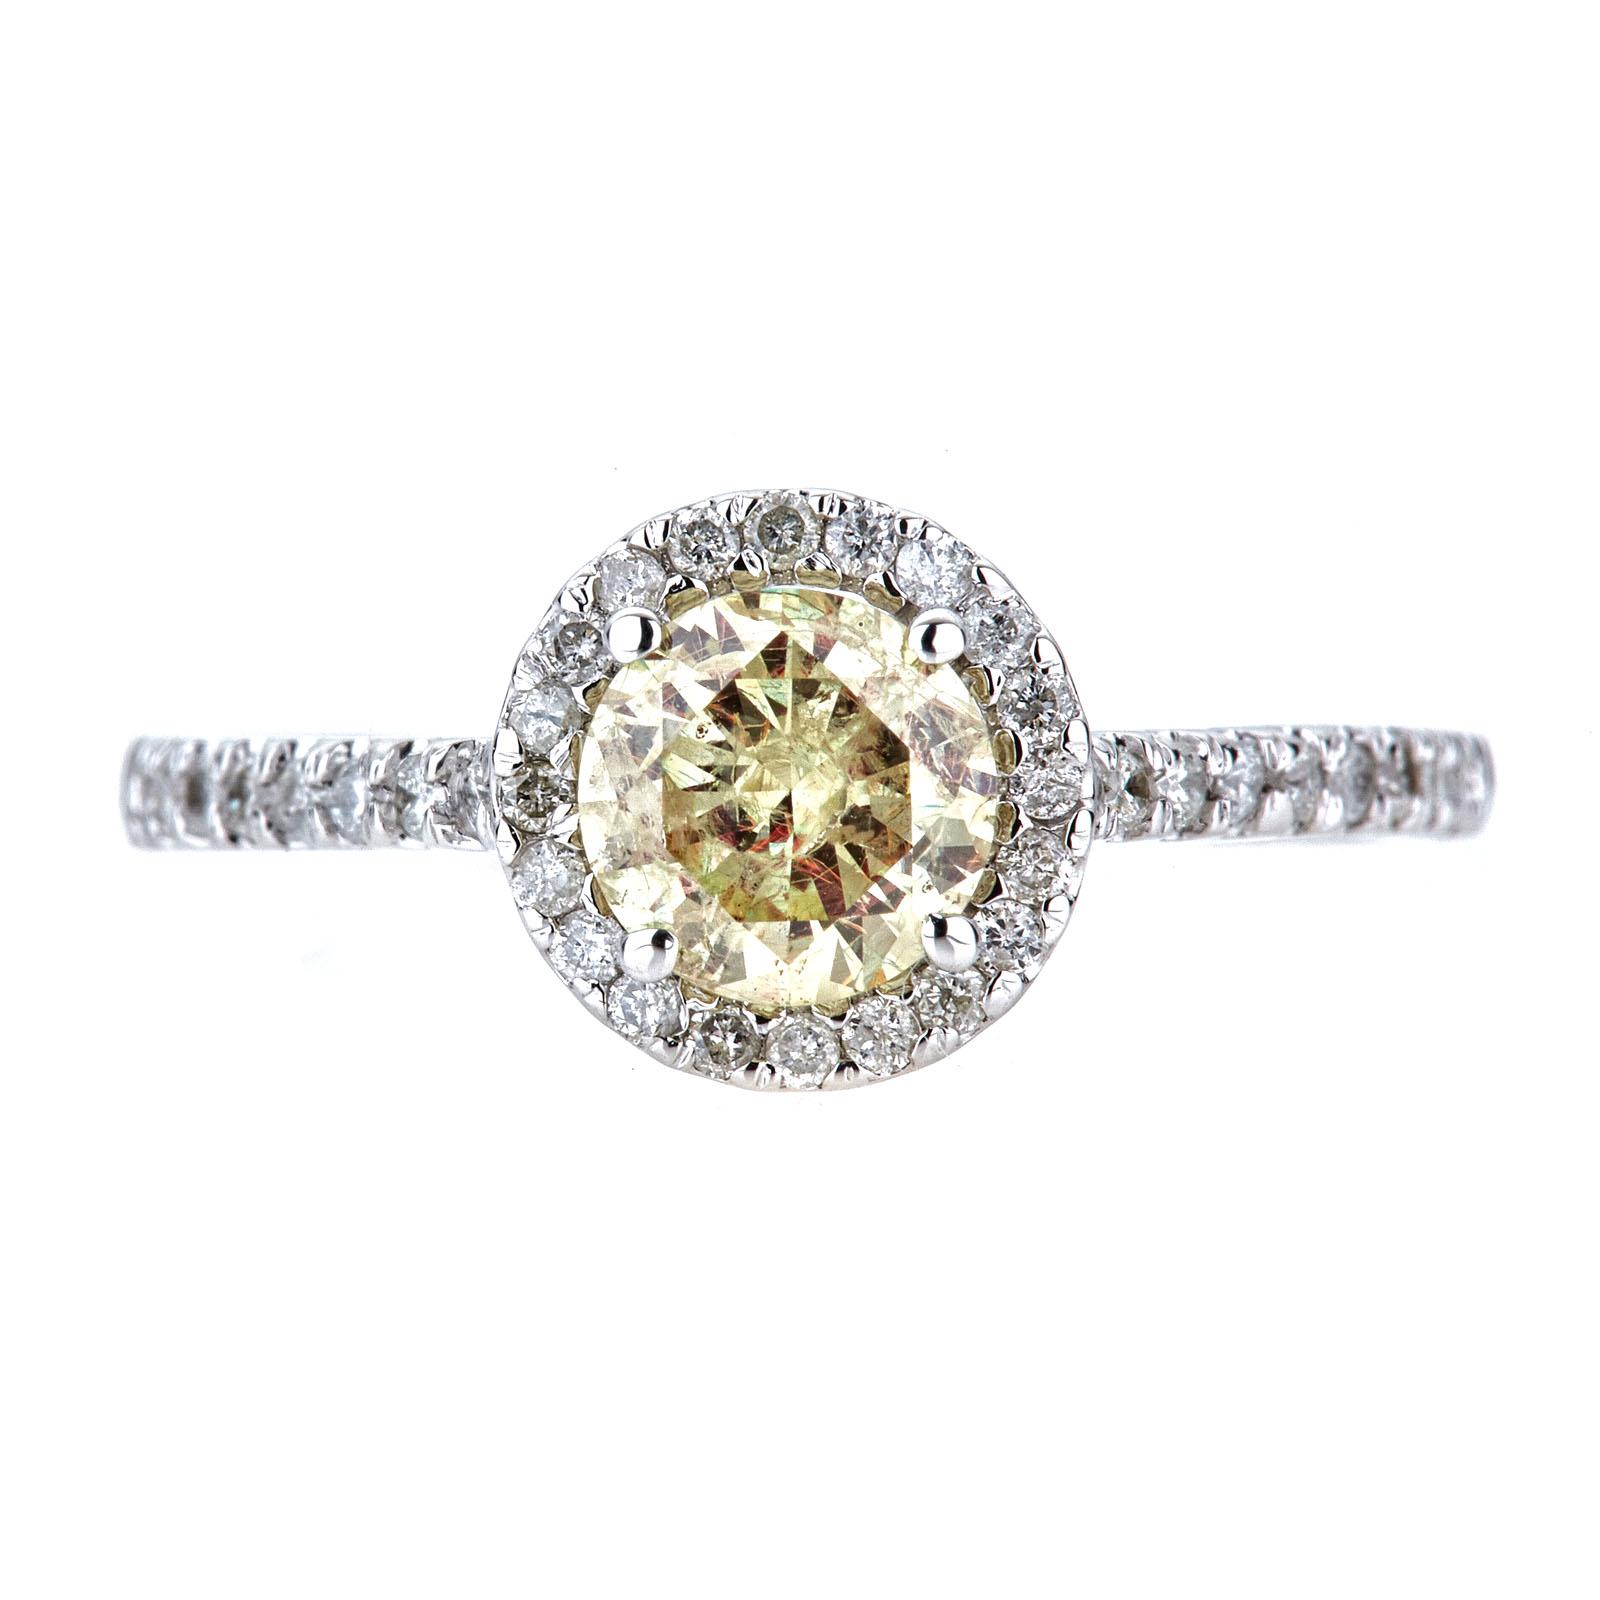 Fine Rings Diamond Certified 0.87 Carat E Si2 Round Brillant Halo Diamond Ring 14k W Gold Enhanced